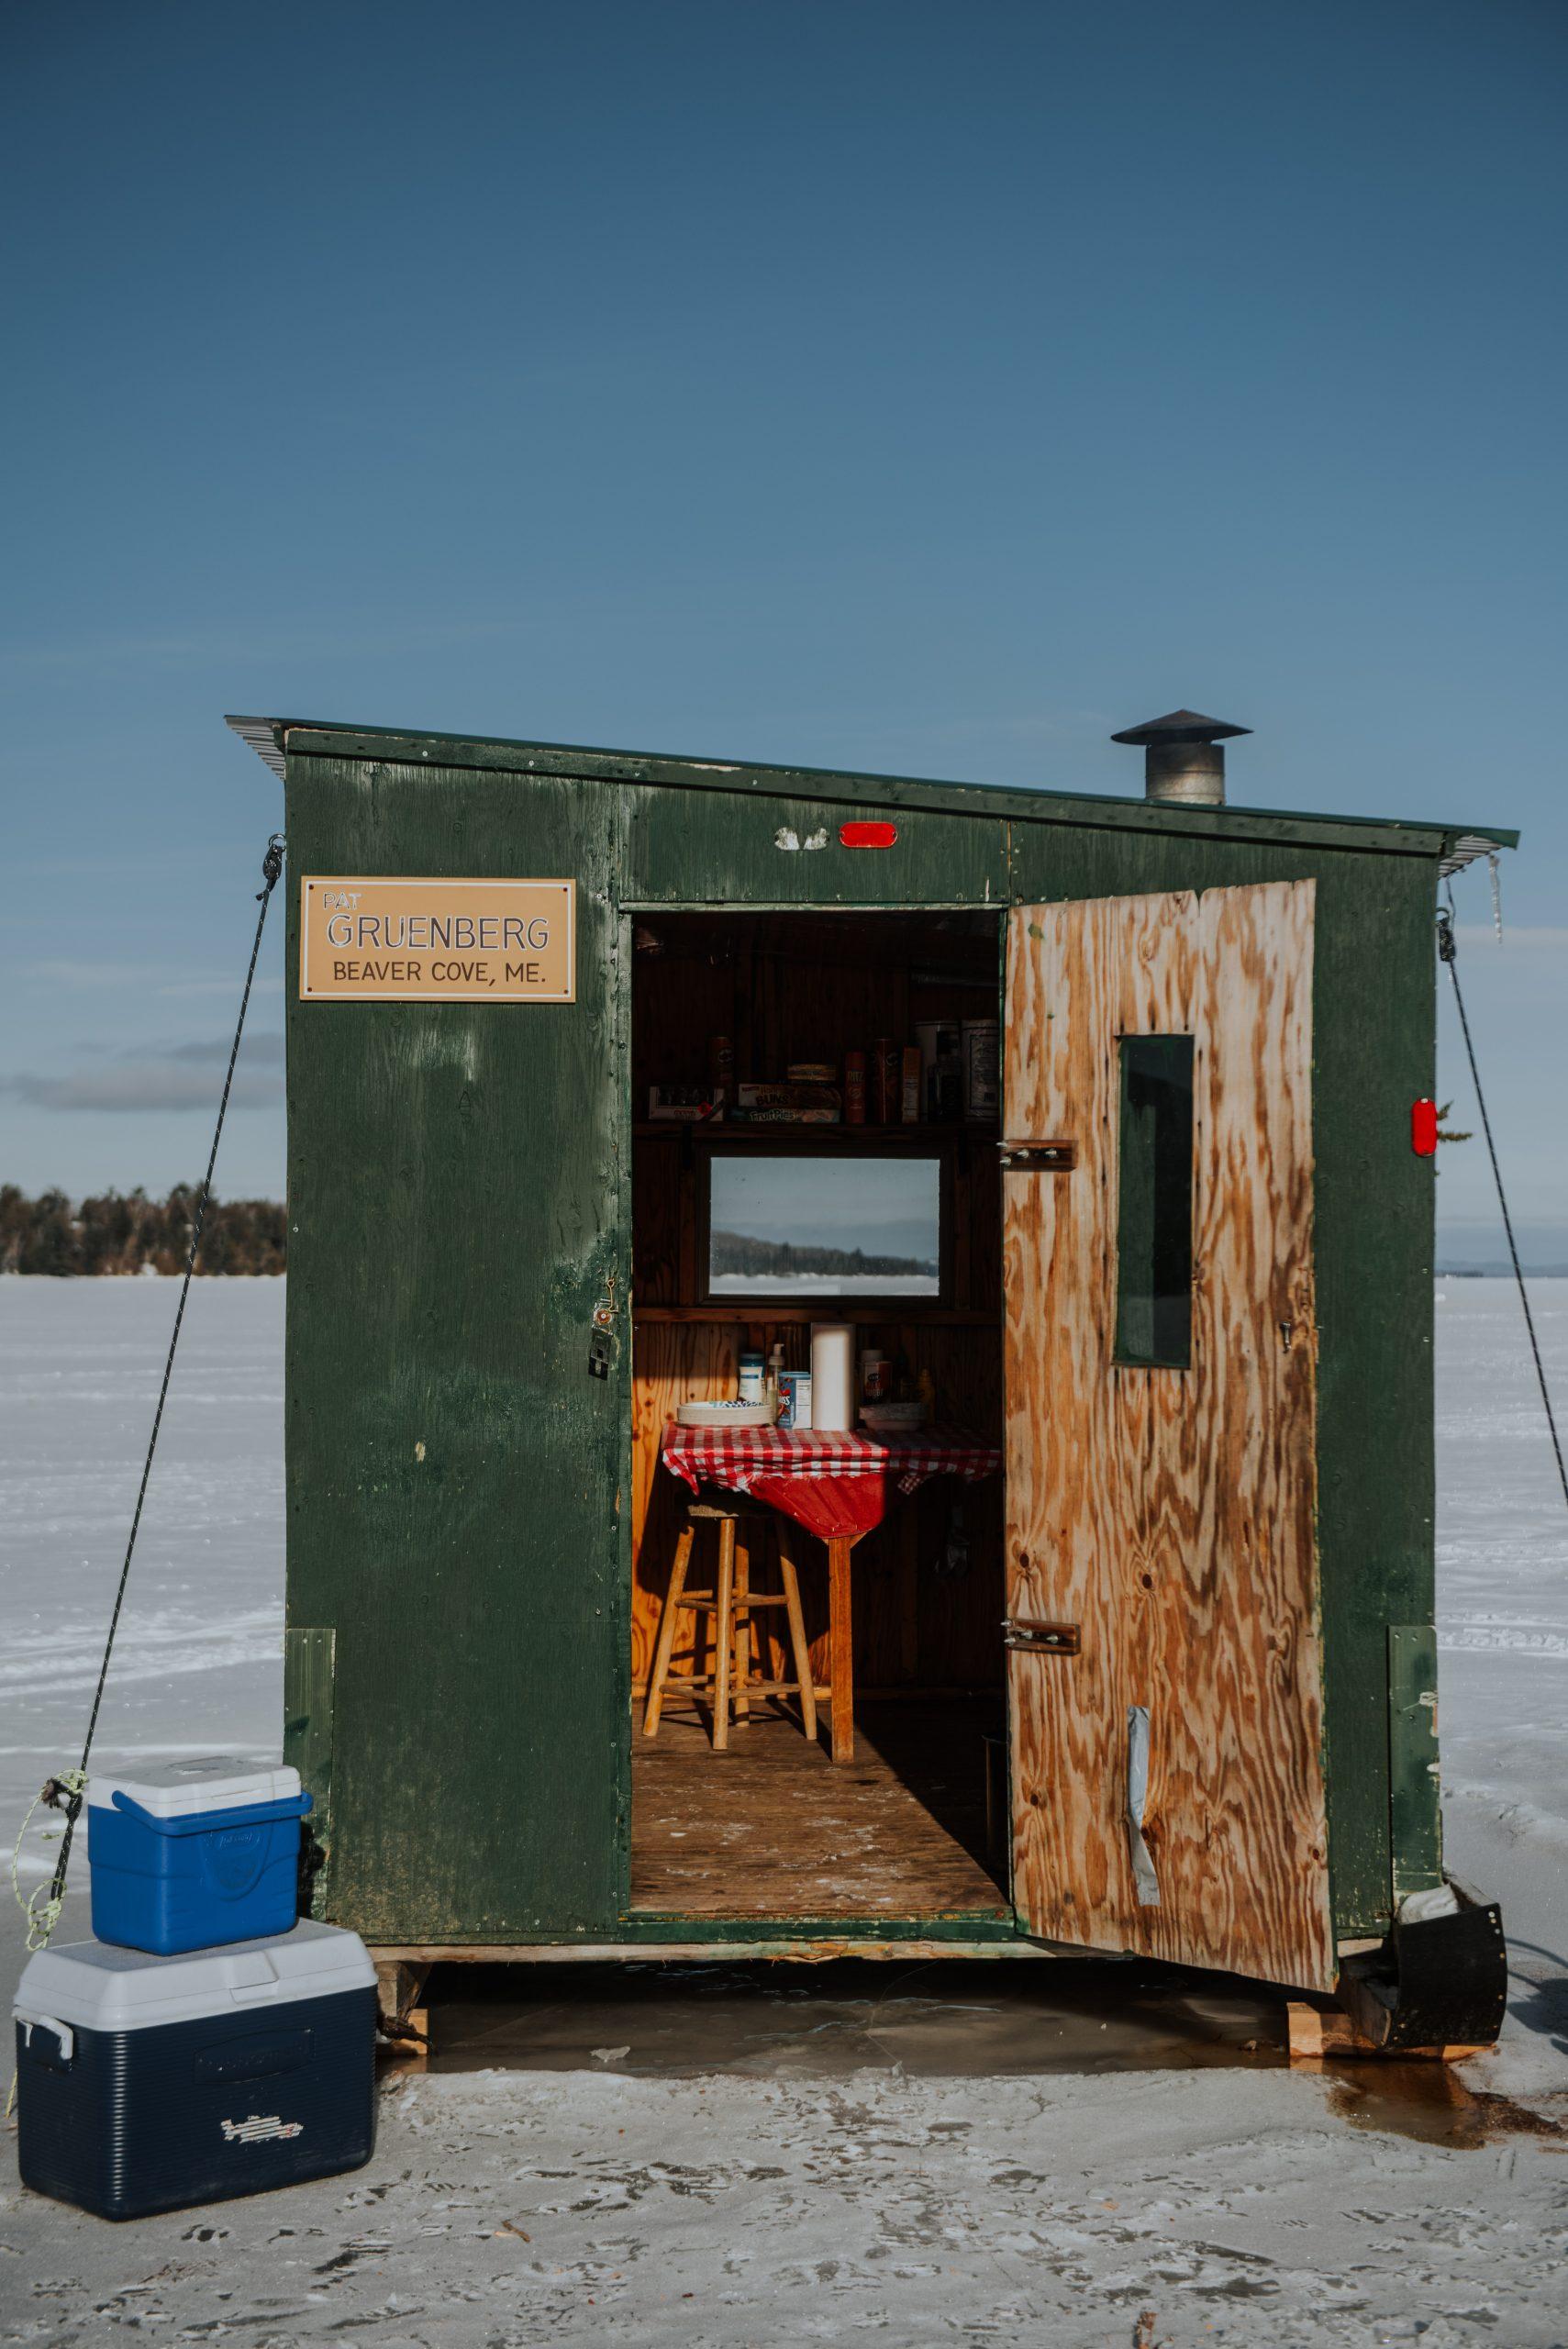 Ice Fishing hut on Moosehead Lake in Maine